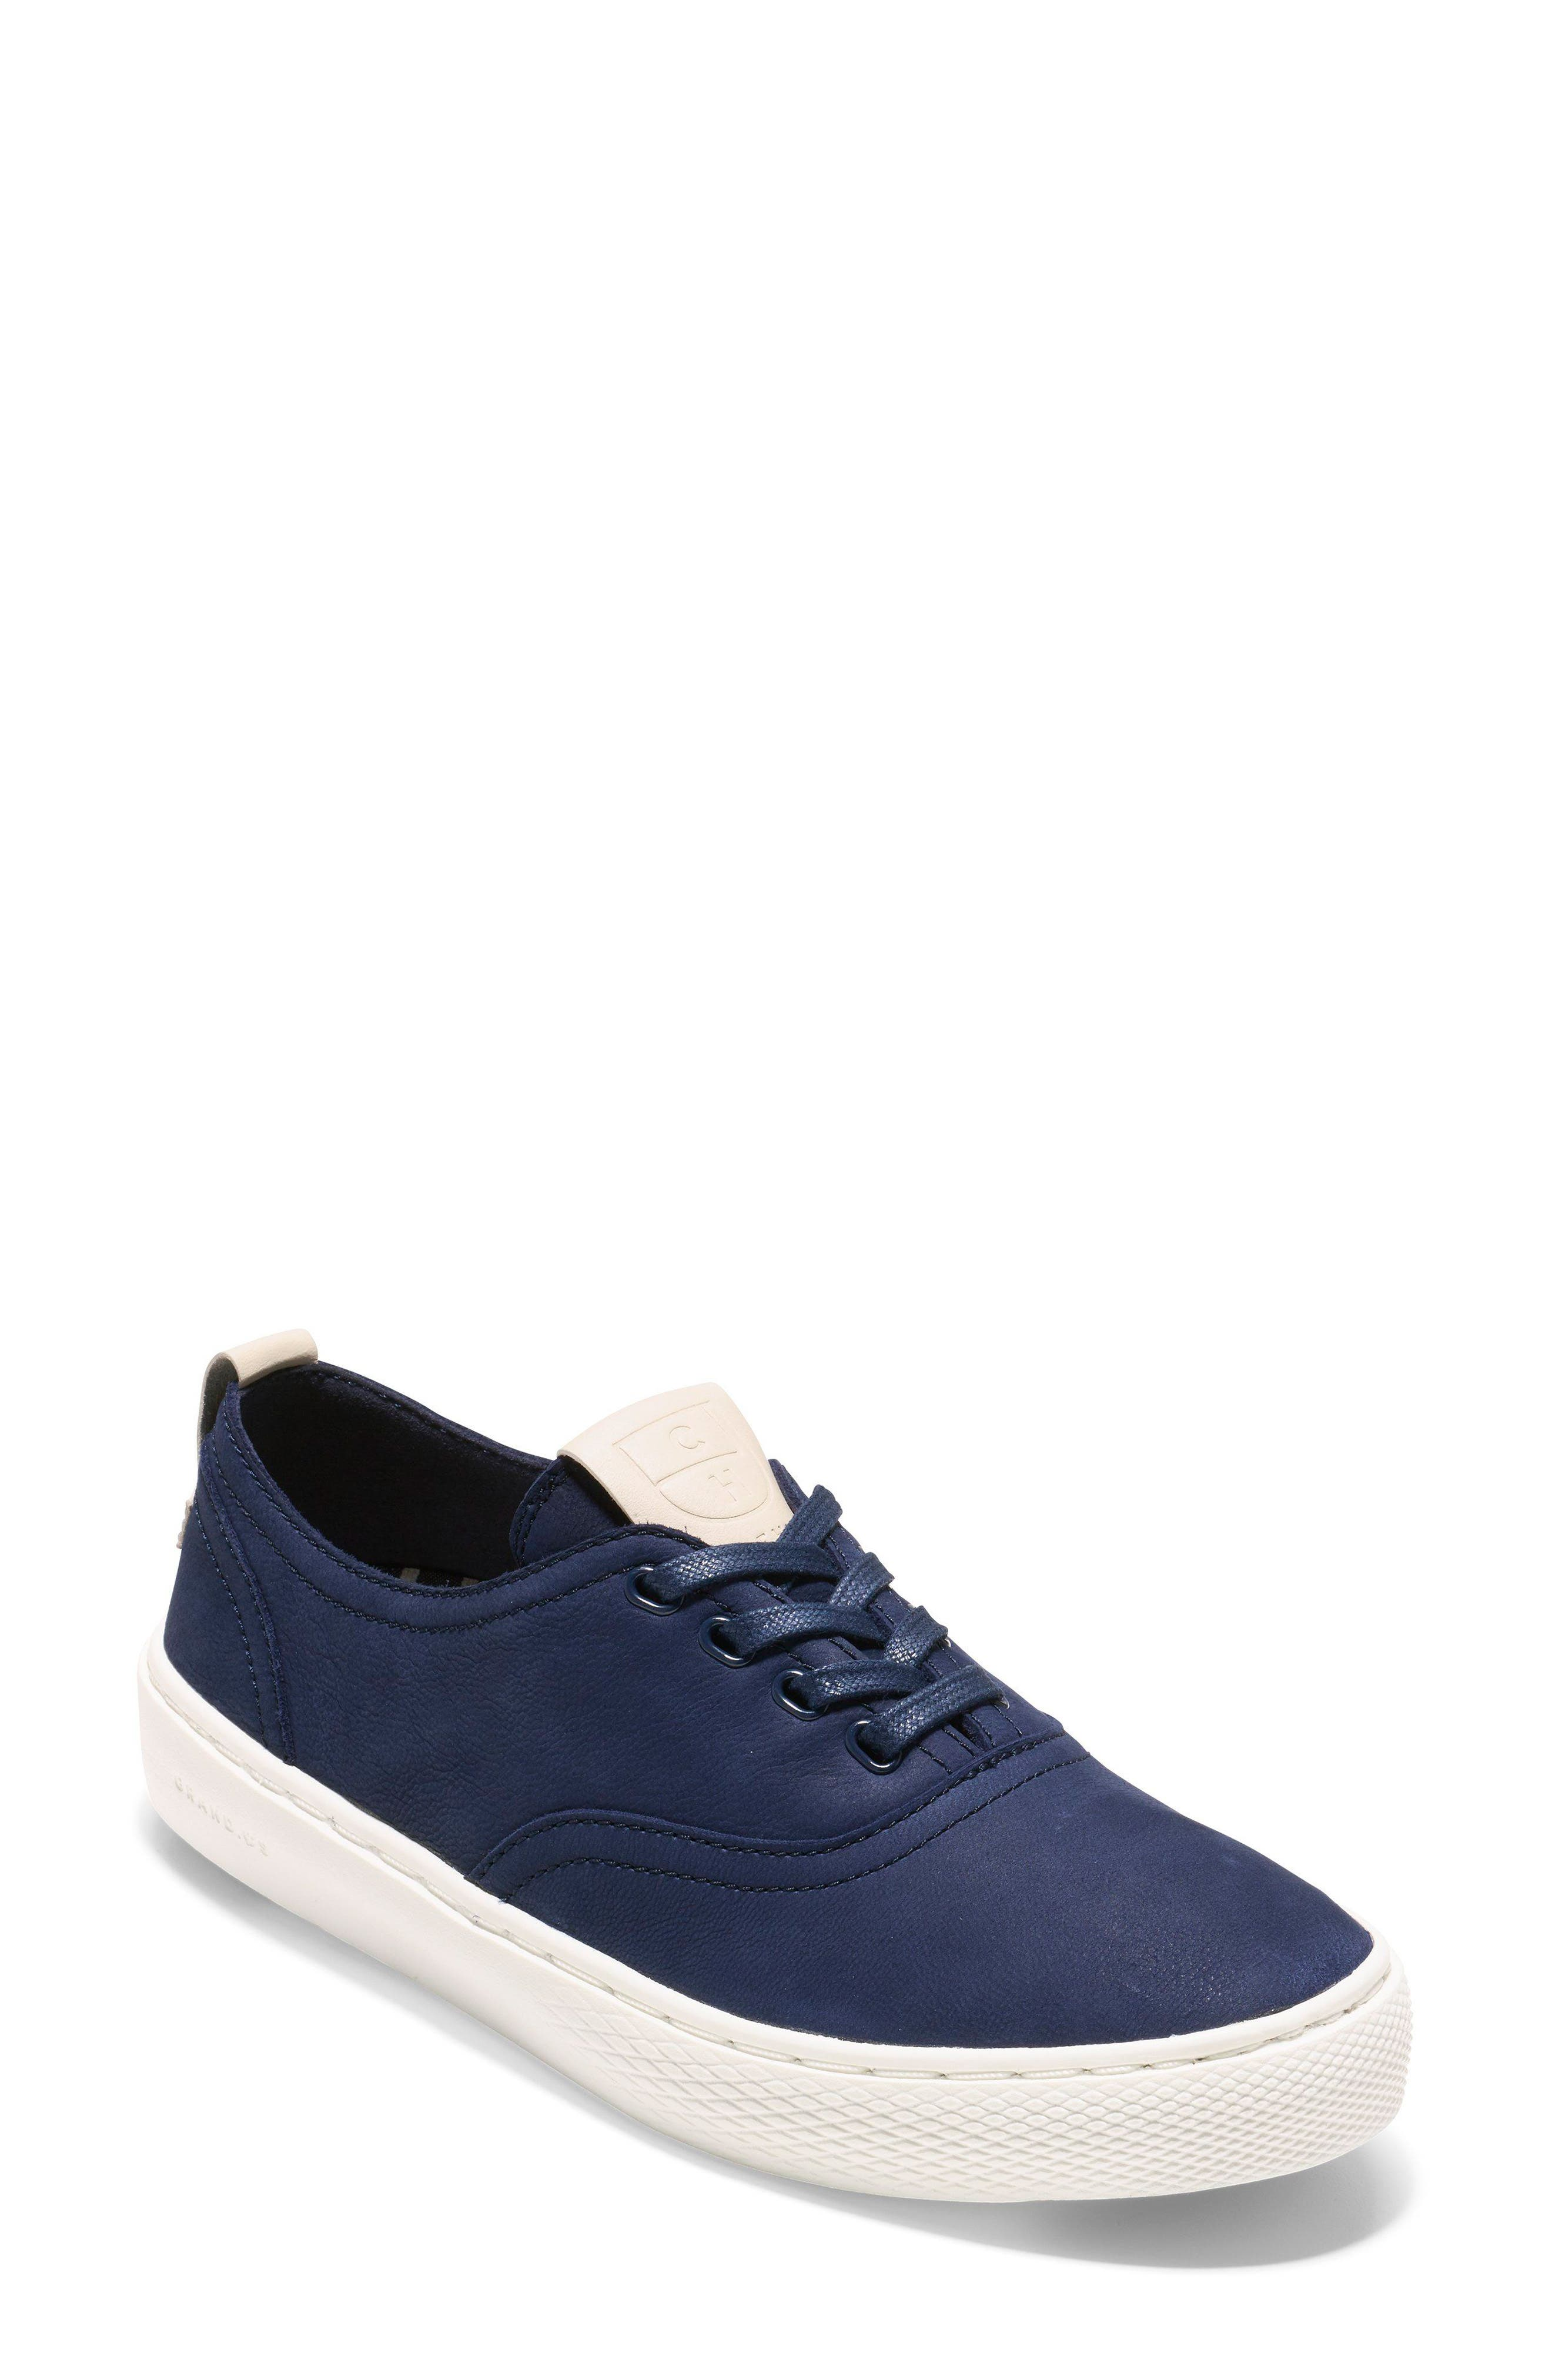 GrandPro Deck Sneaker,                             Main thumbnail 1, color,                             Blue/ White Nubuck